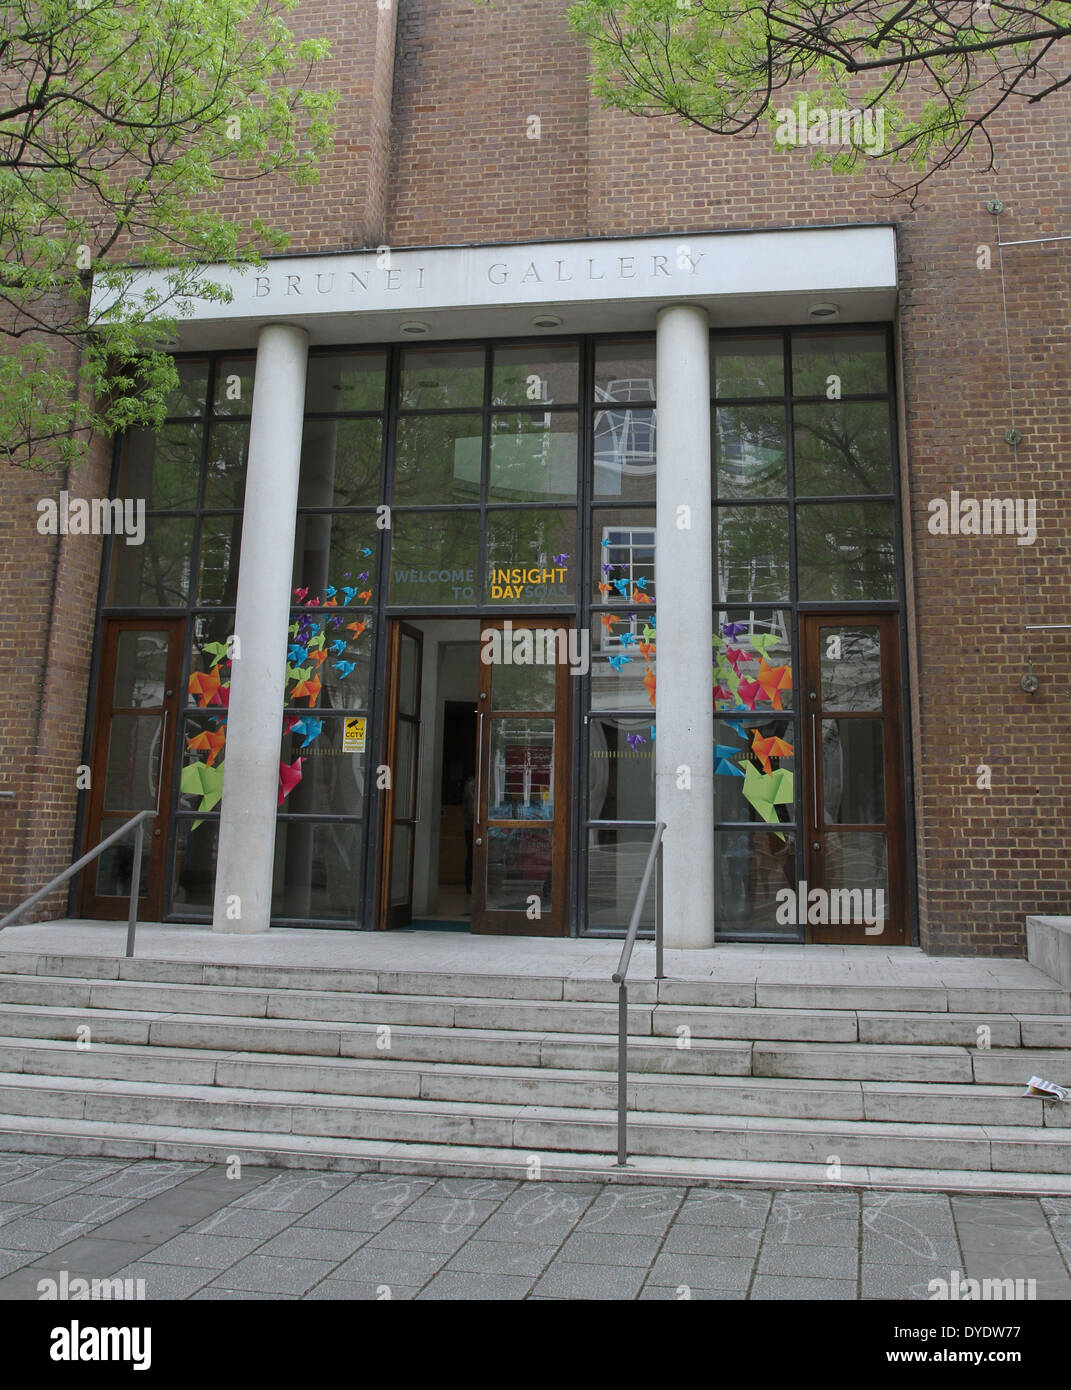 Exterior of Brunei Gallery London UK  April 2014 - Stock Image